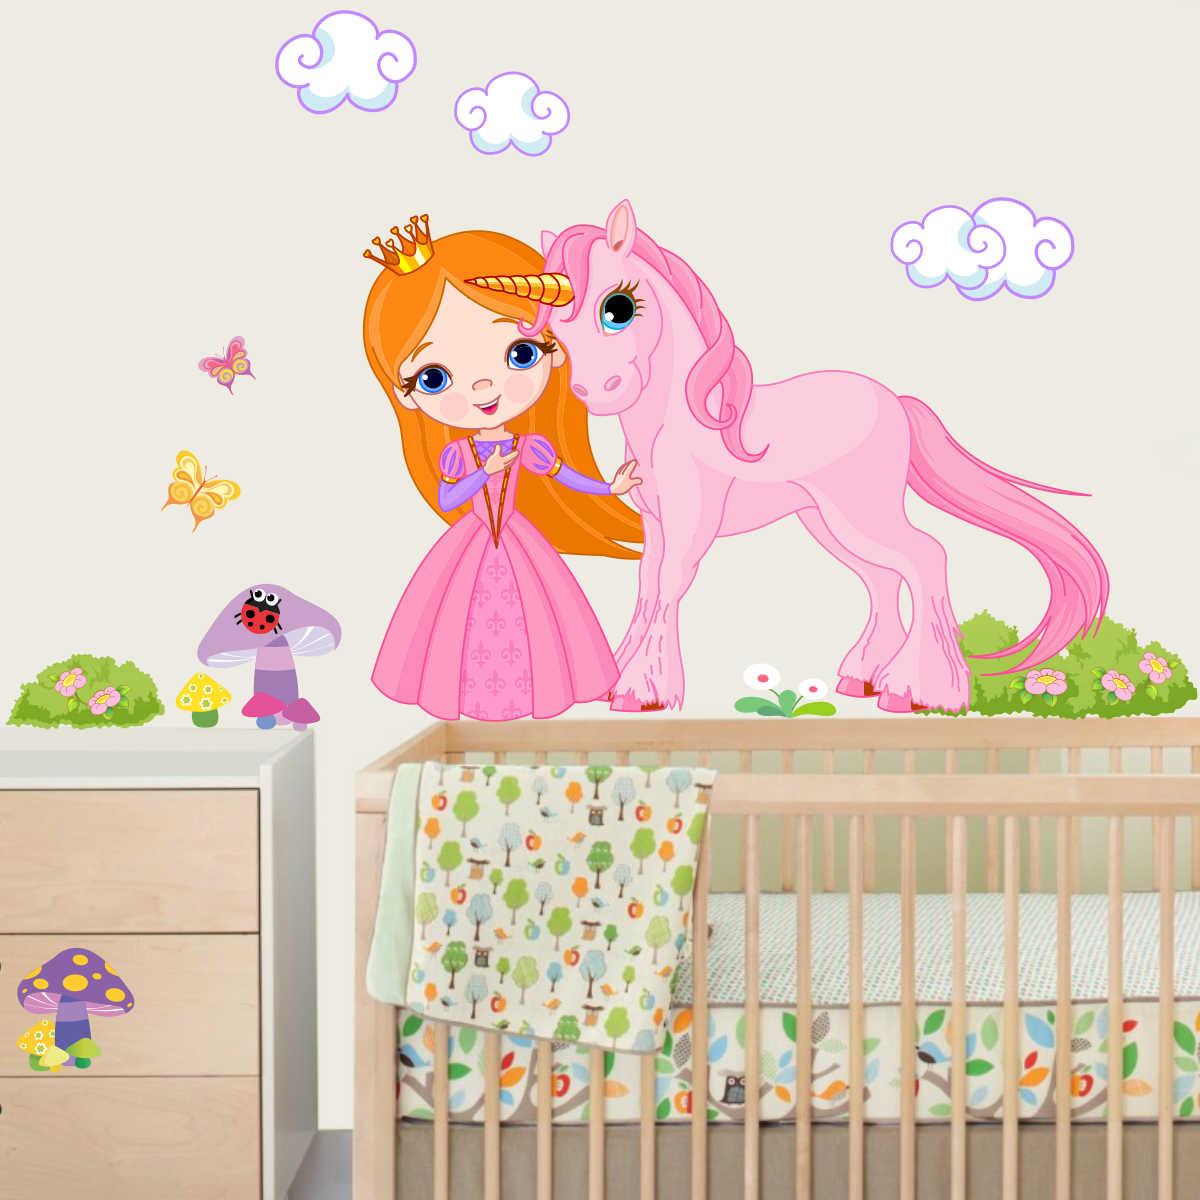 Stickere perete copii Printesa roz - 84 x 80 cm imagine